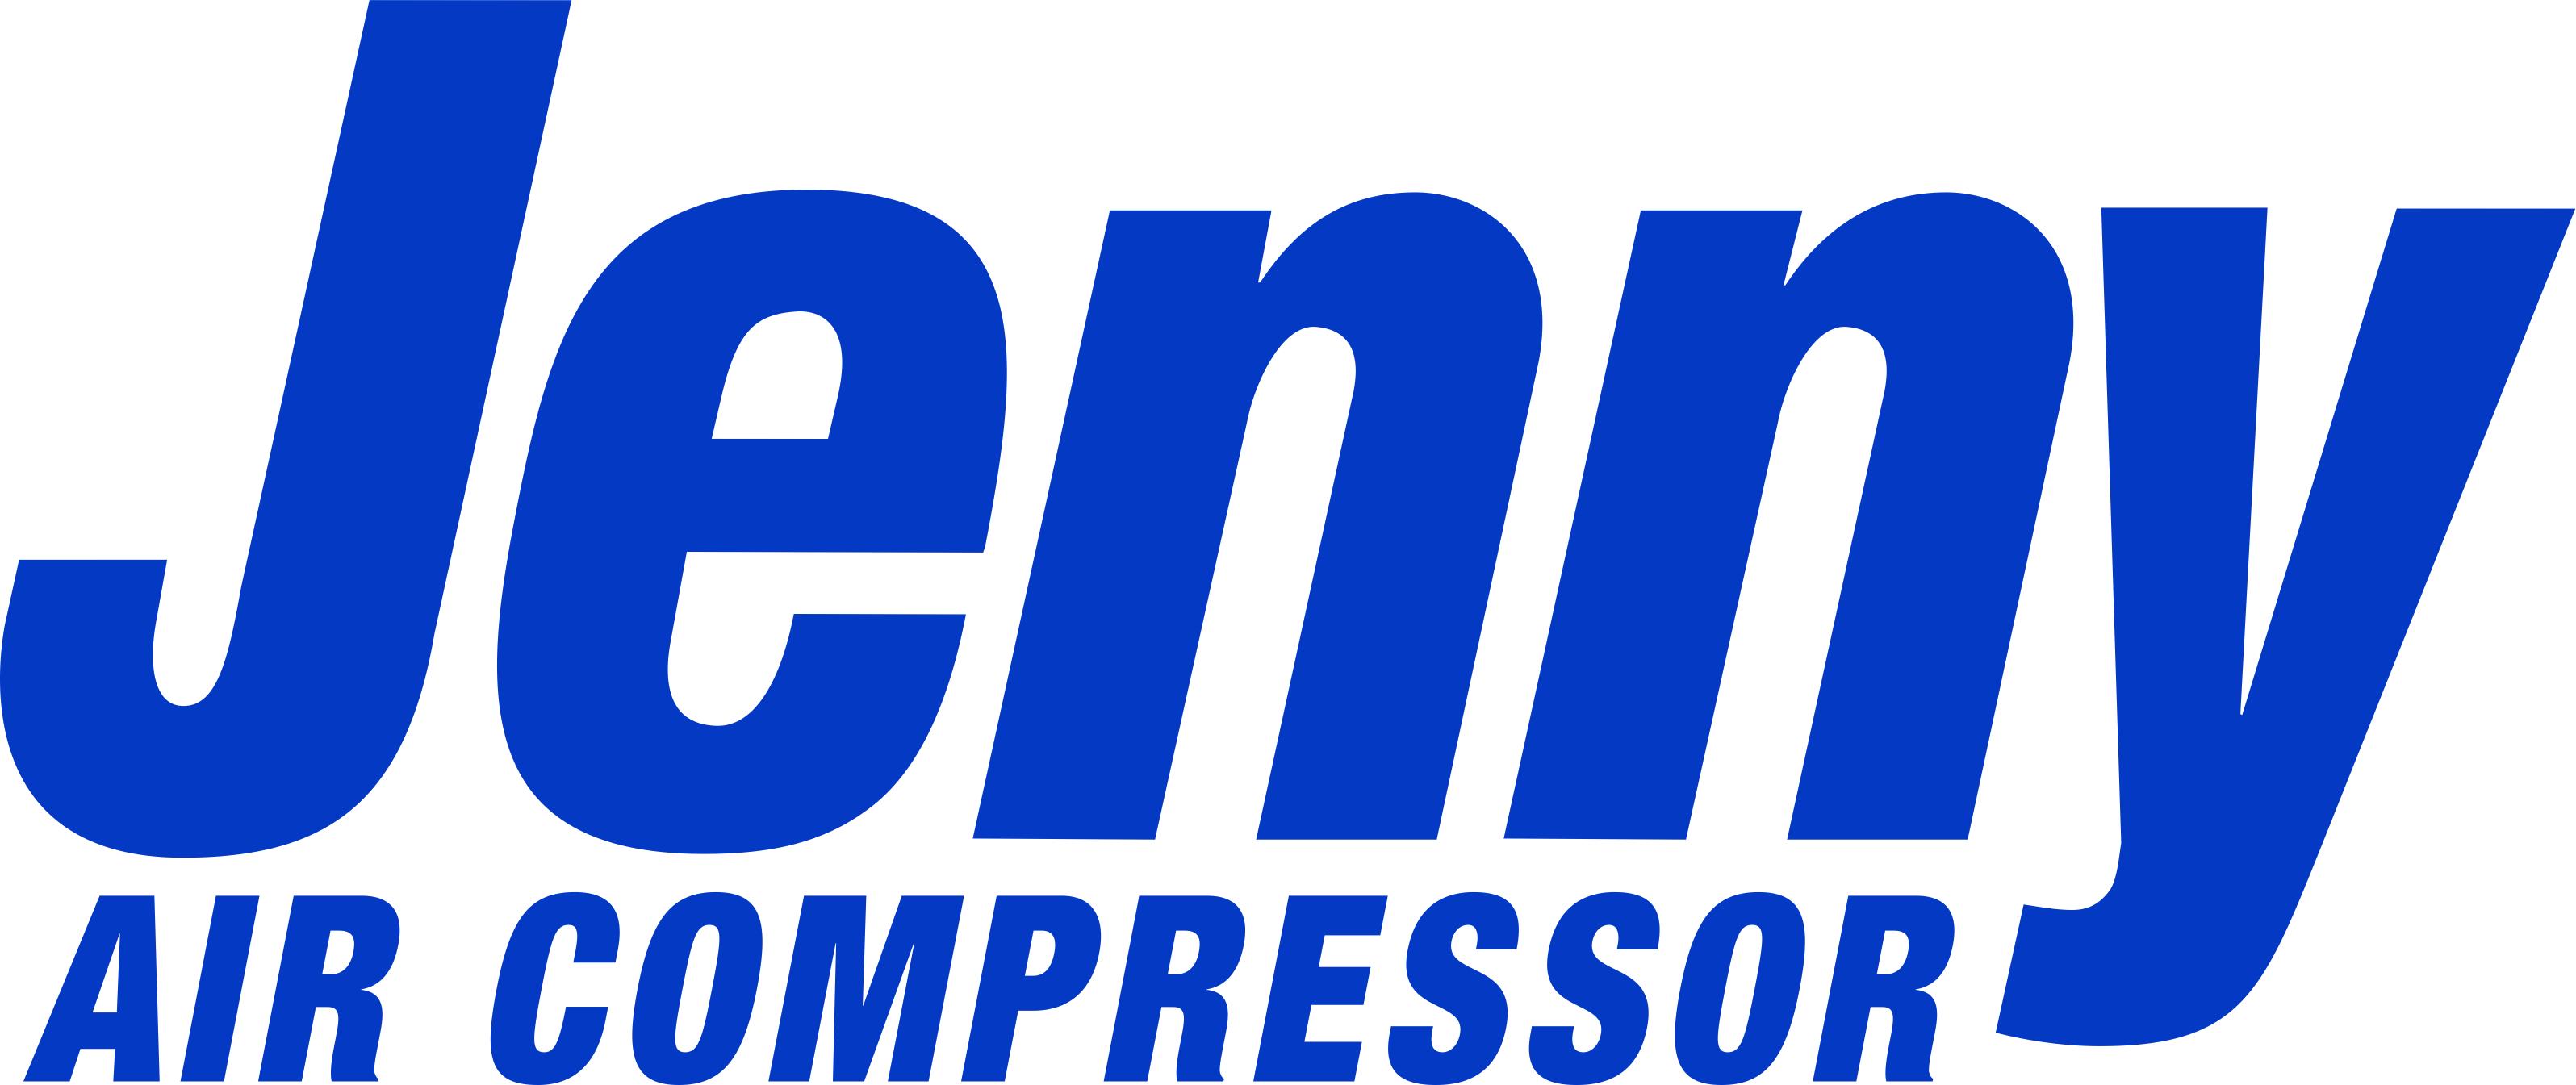 jenny-logo.jpg